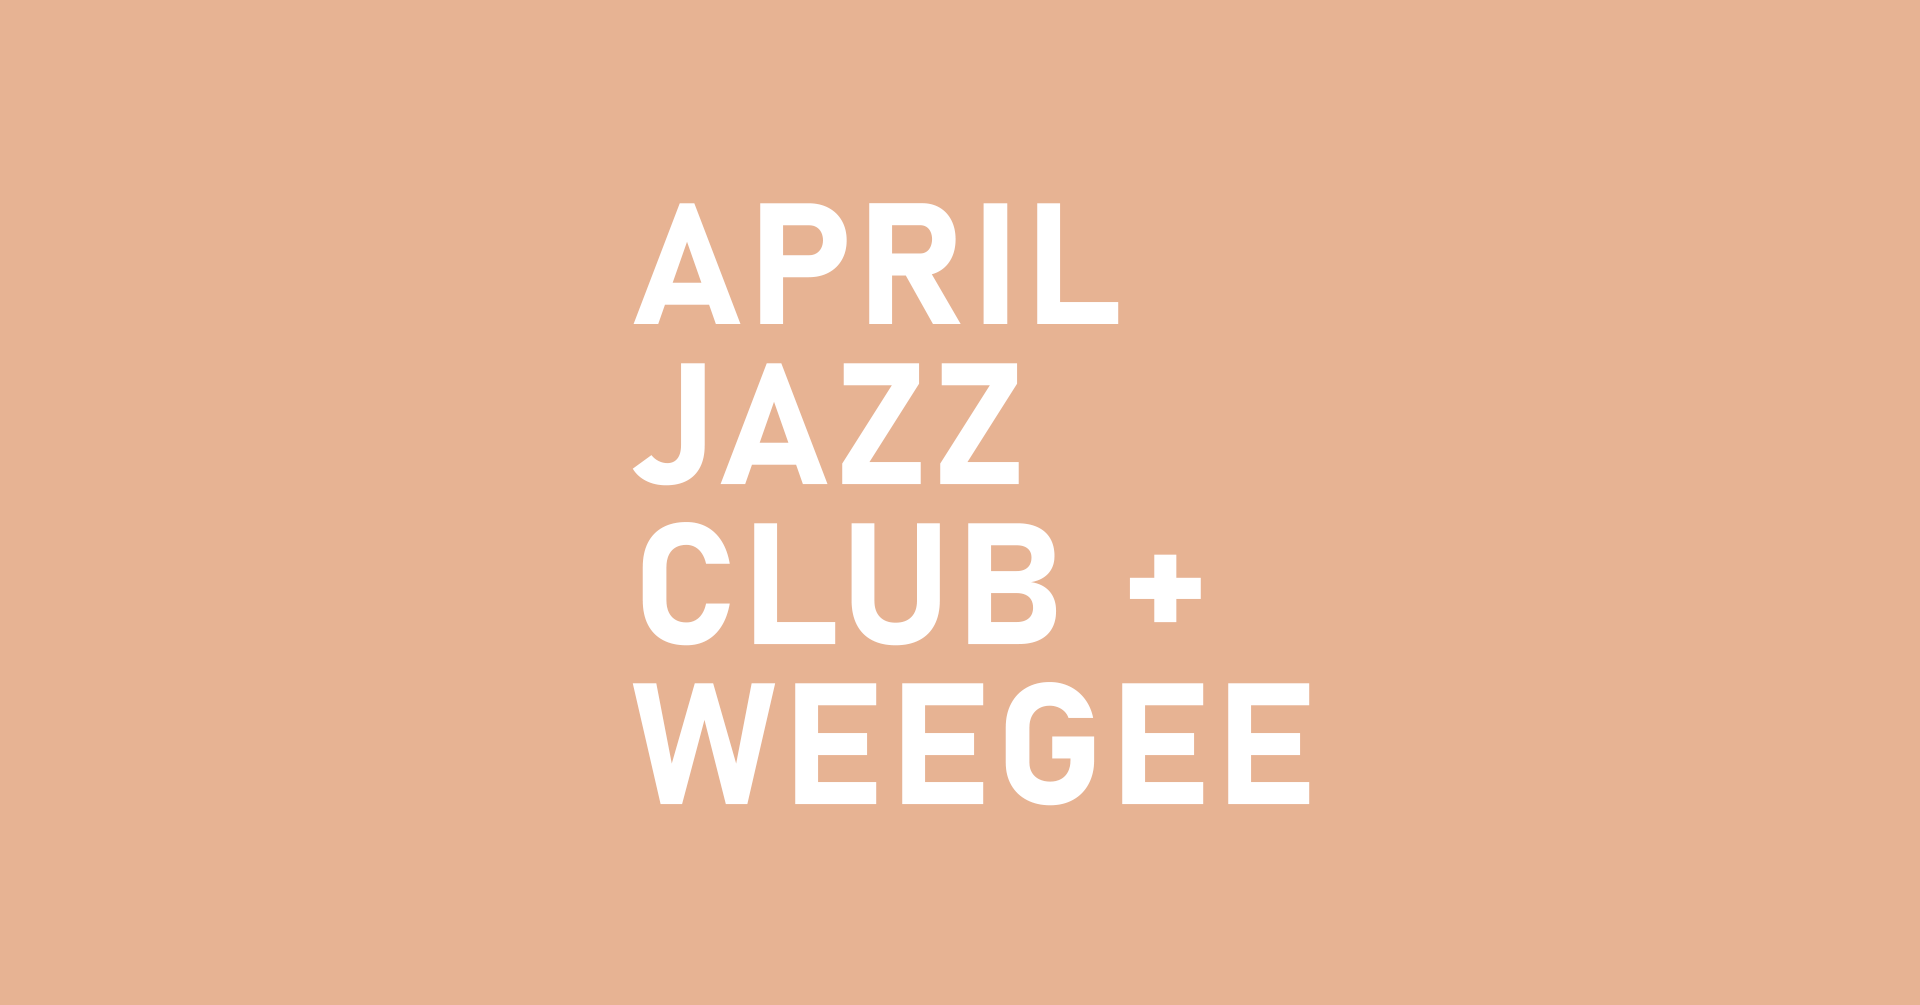 April Jazz Club + WeeGee -logo